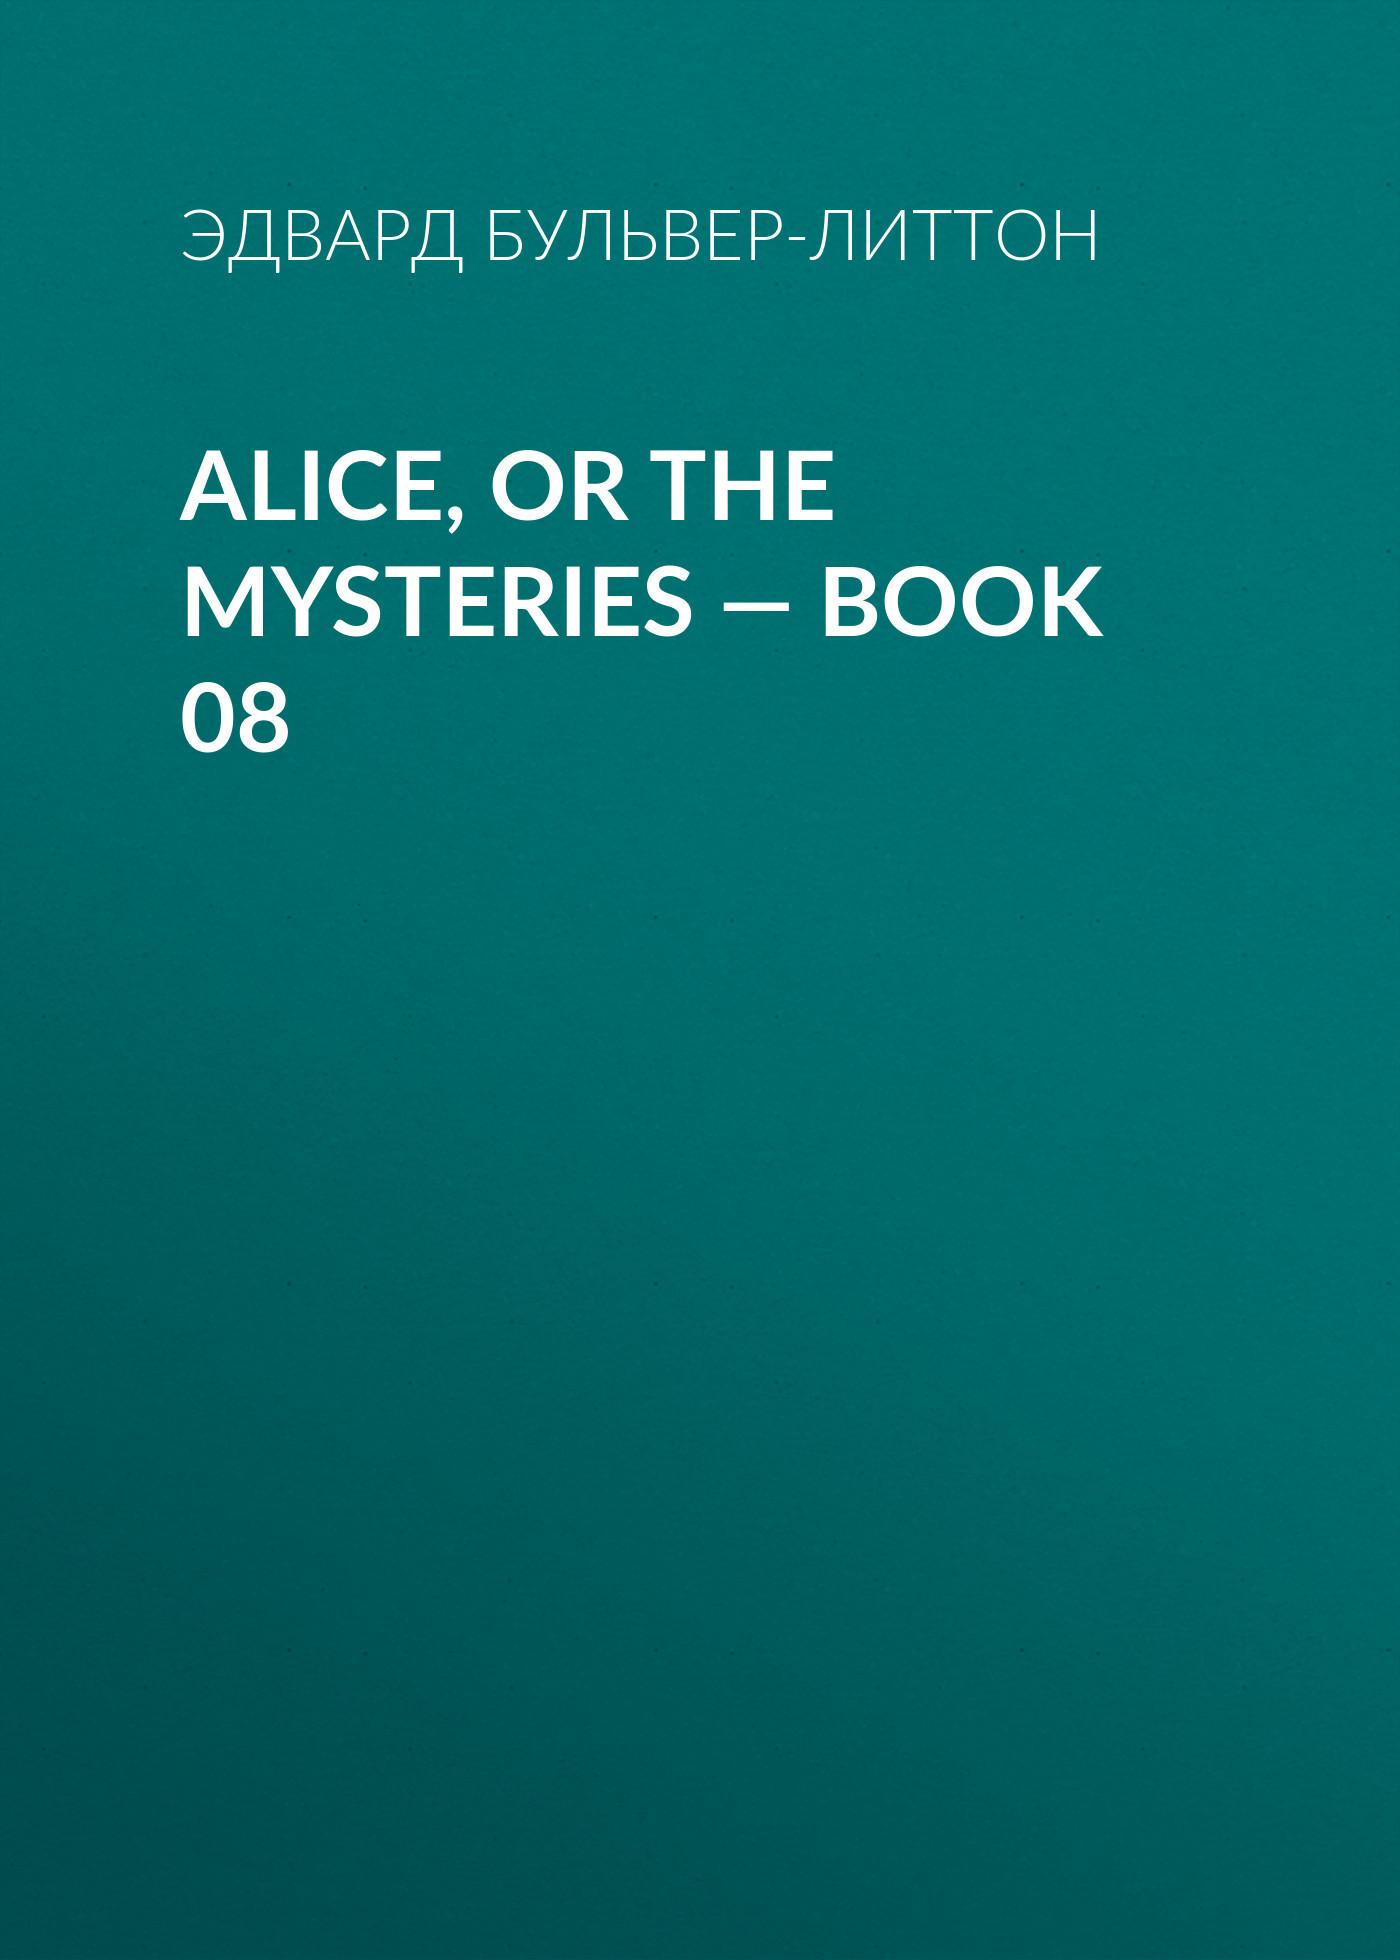 Эдвард Бульвер-Литтон Alice, or the Mysteries — Book 08